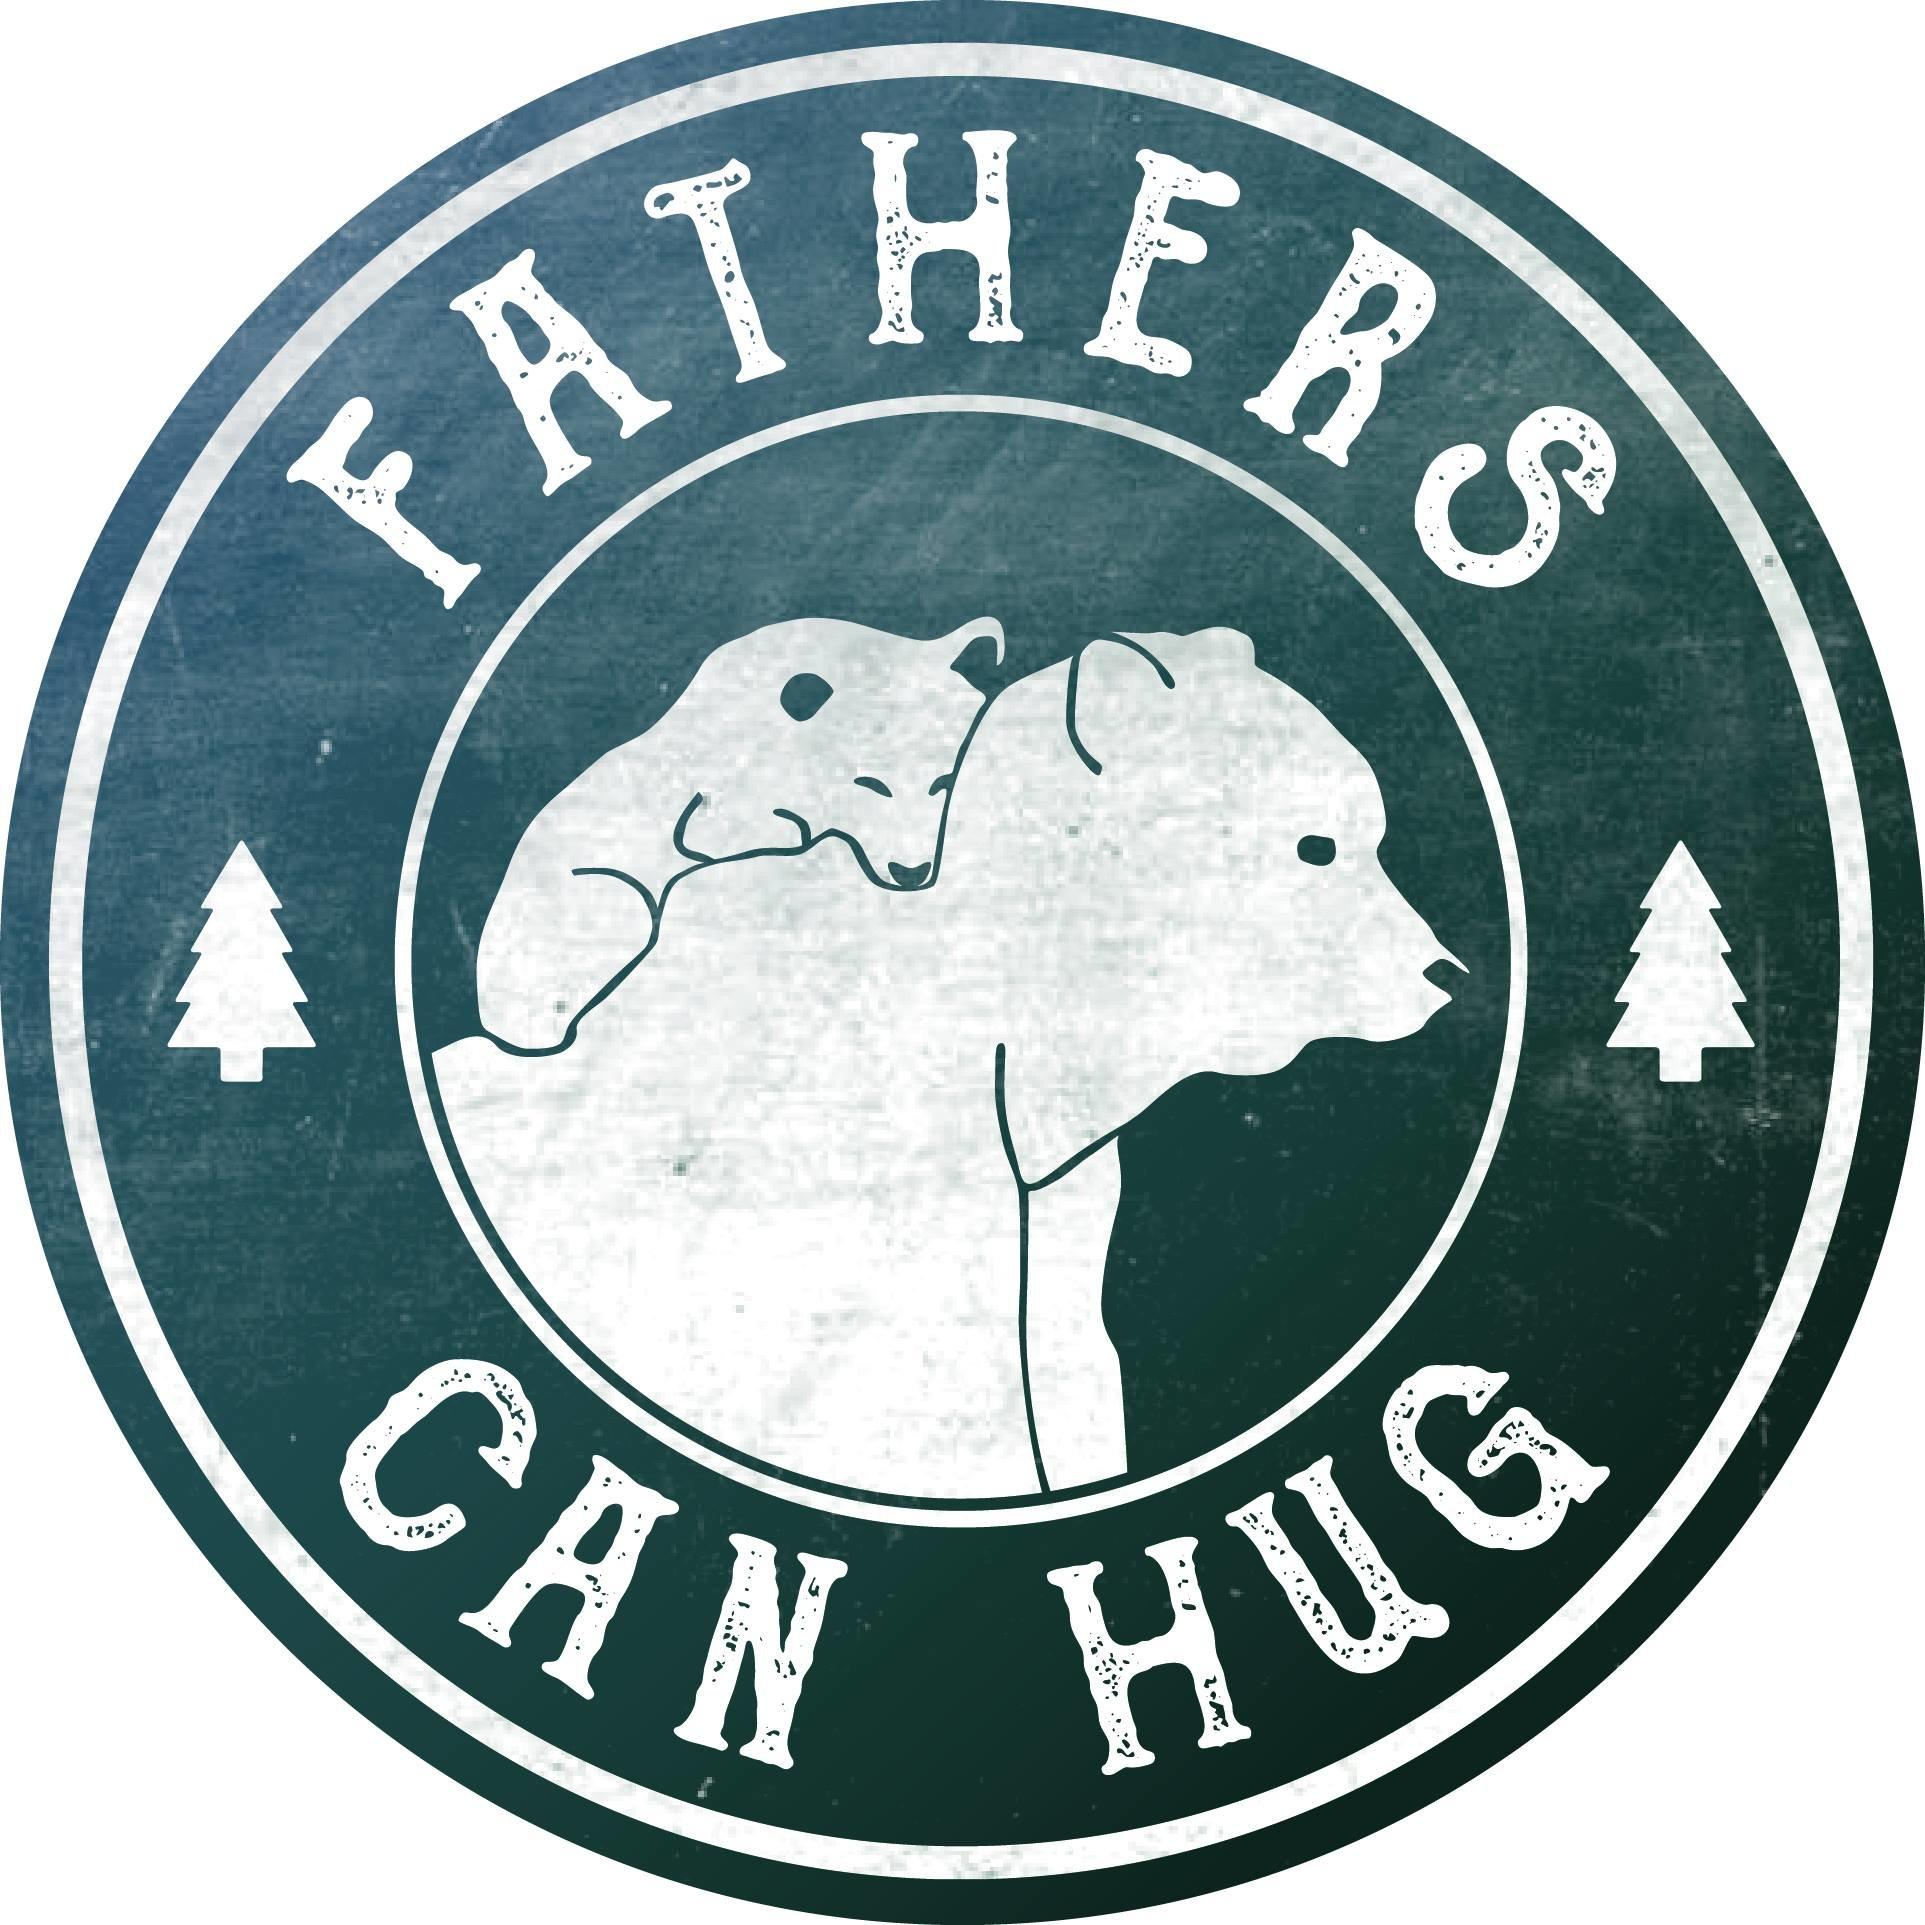 Fathers can hug